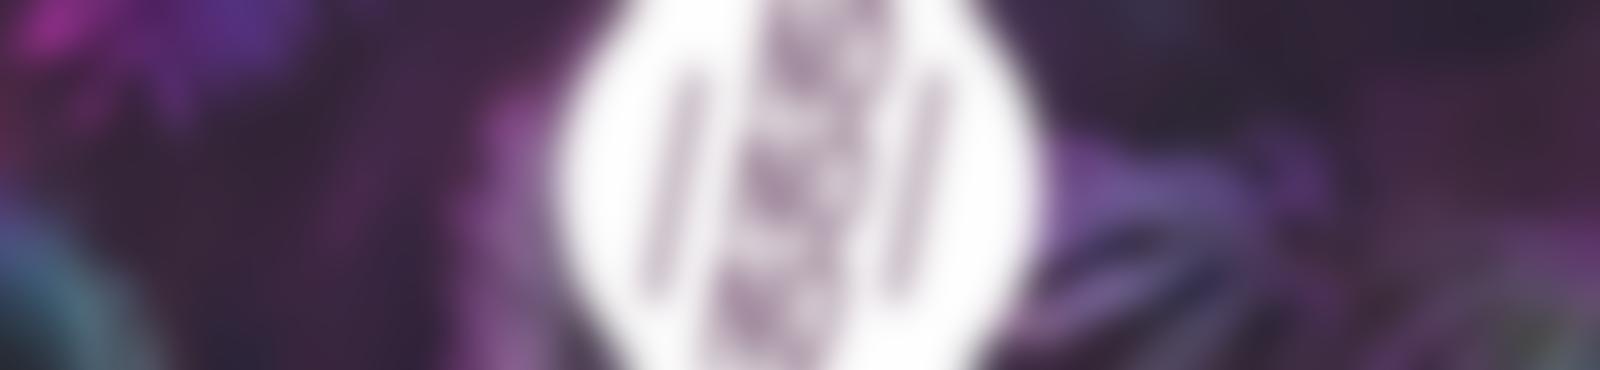 Blurred dc95d768 0368 4034 b70c 7b9b4e502a3b